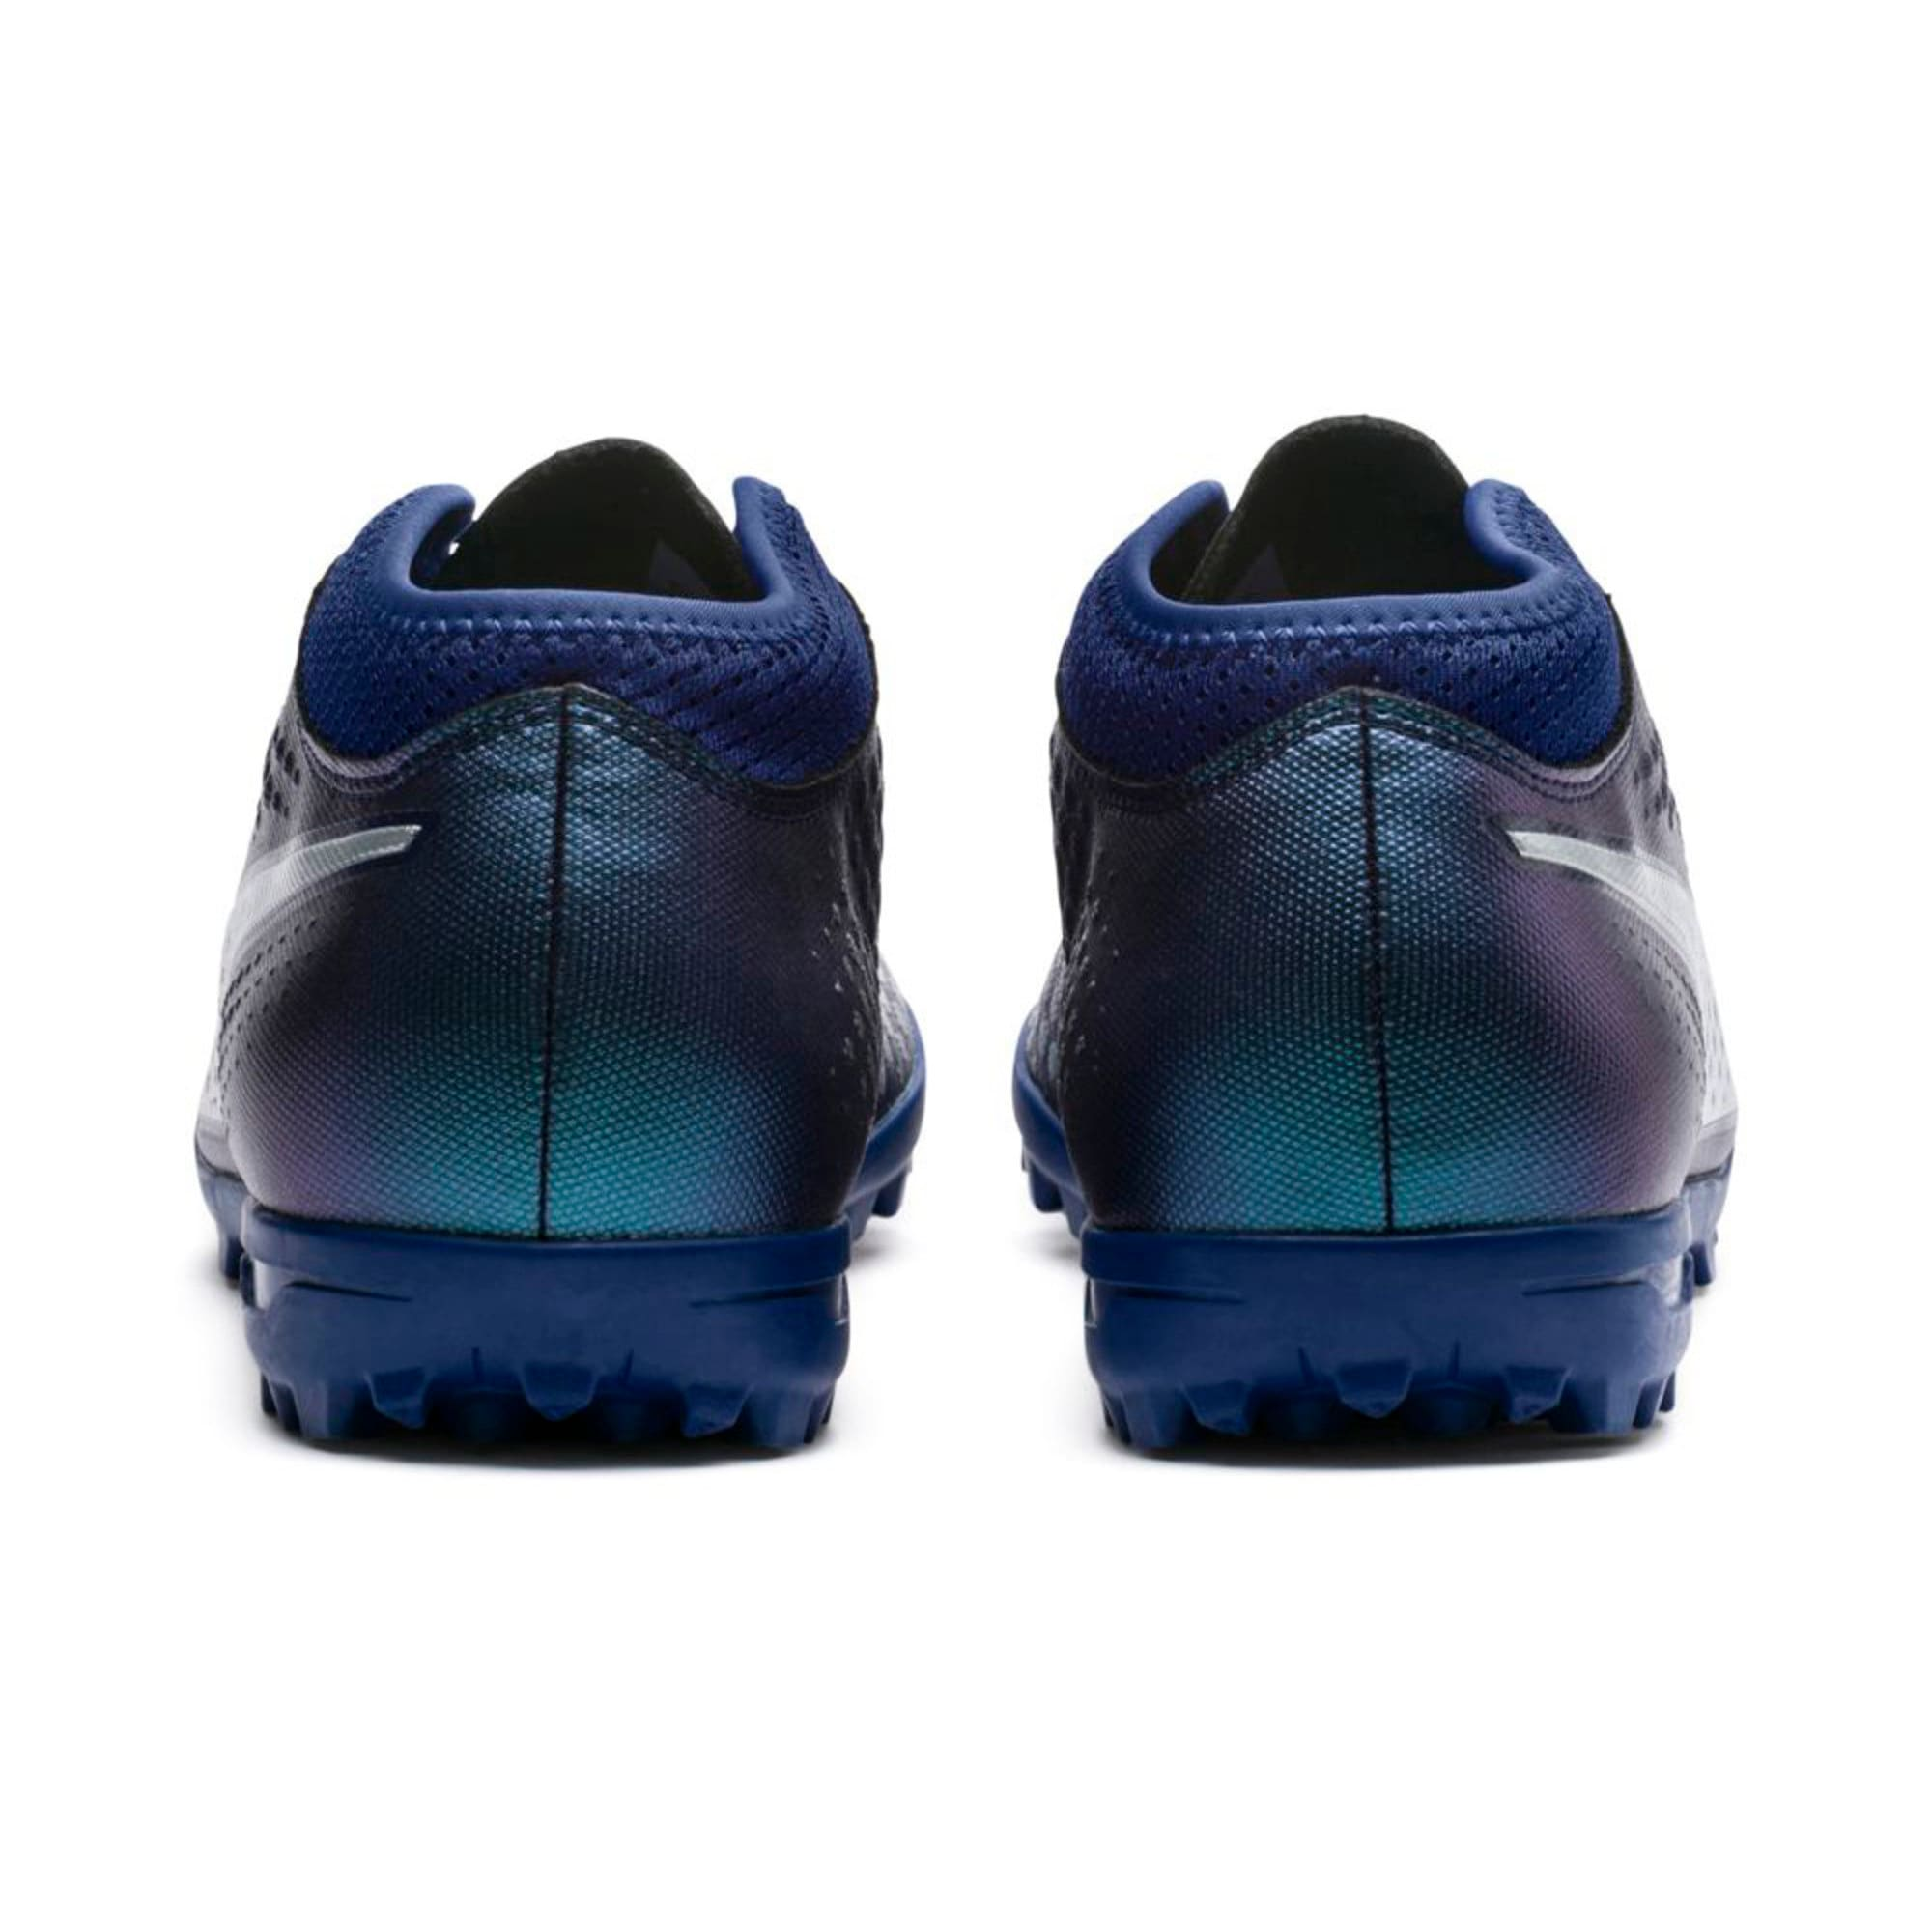 Thumbnail 3 of PUMA ONE 4 Synthetic TT Men's Football Boots, Sodalite Blue-Silver-Peacoat, medium-IND